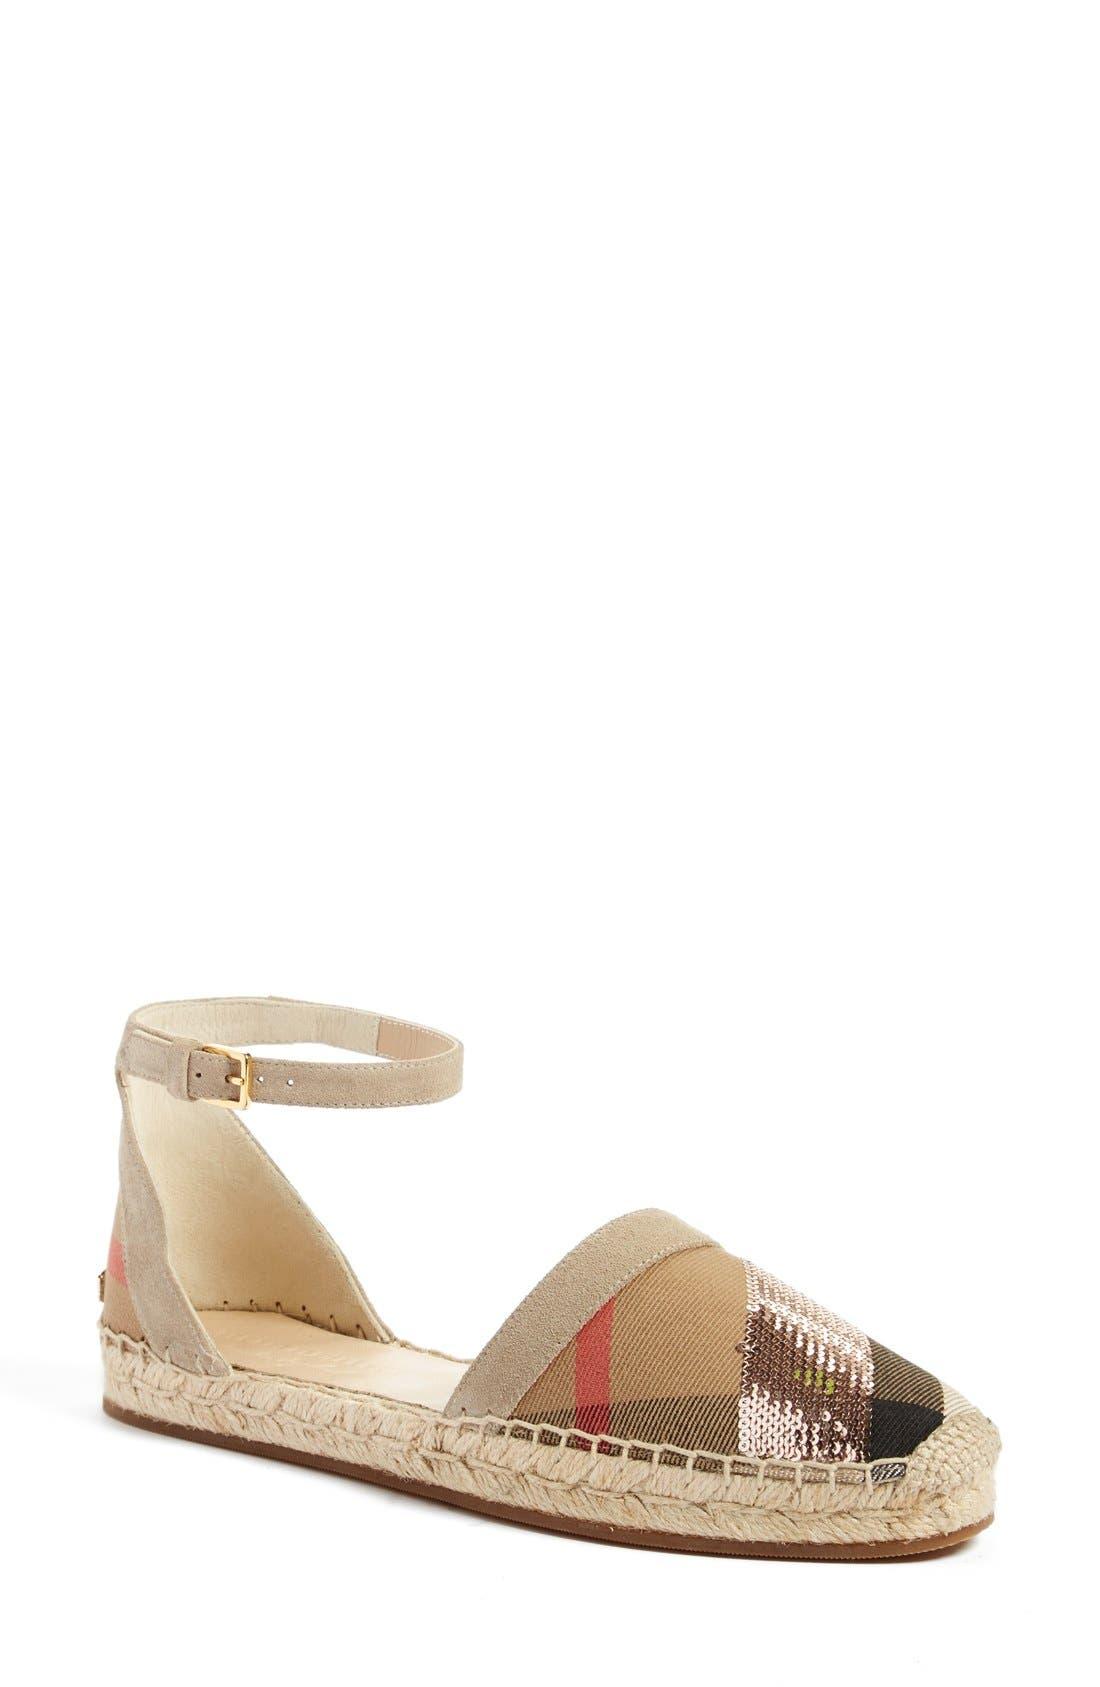 'Abbingdon' Ankle Strap Espadrille Sandal,                         Main,                         color, Grey/ Pale Pink